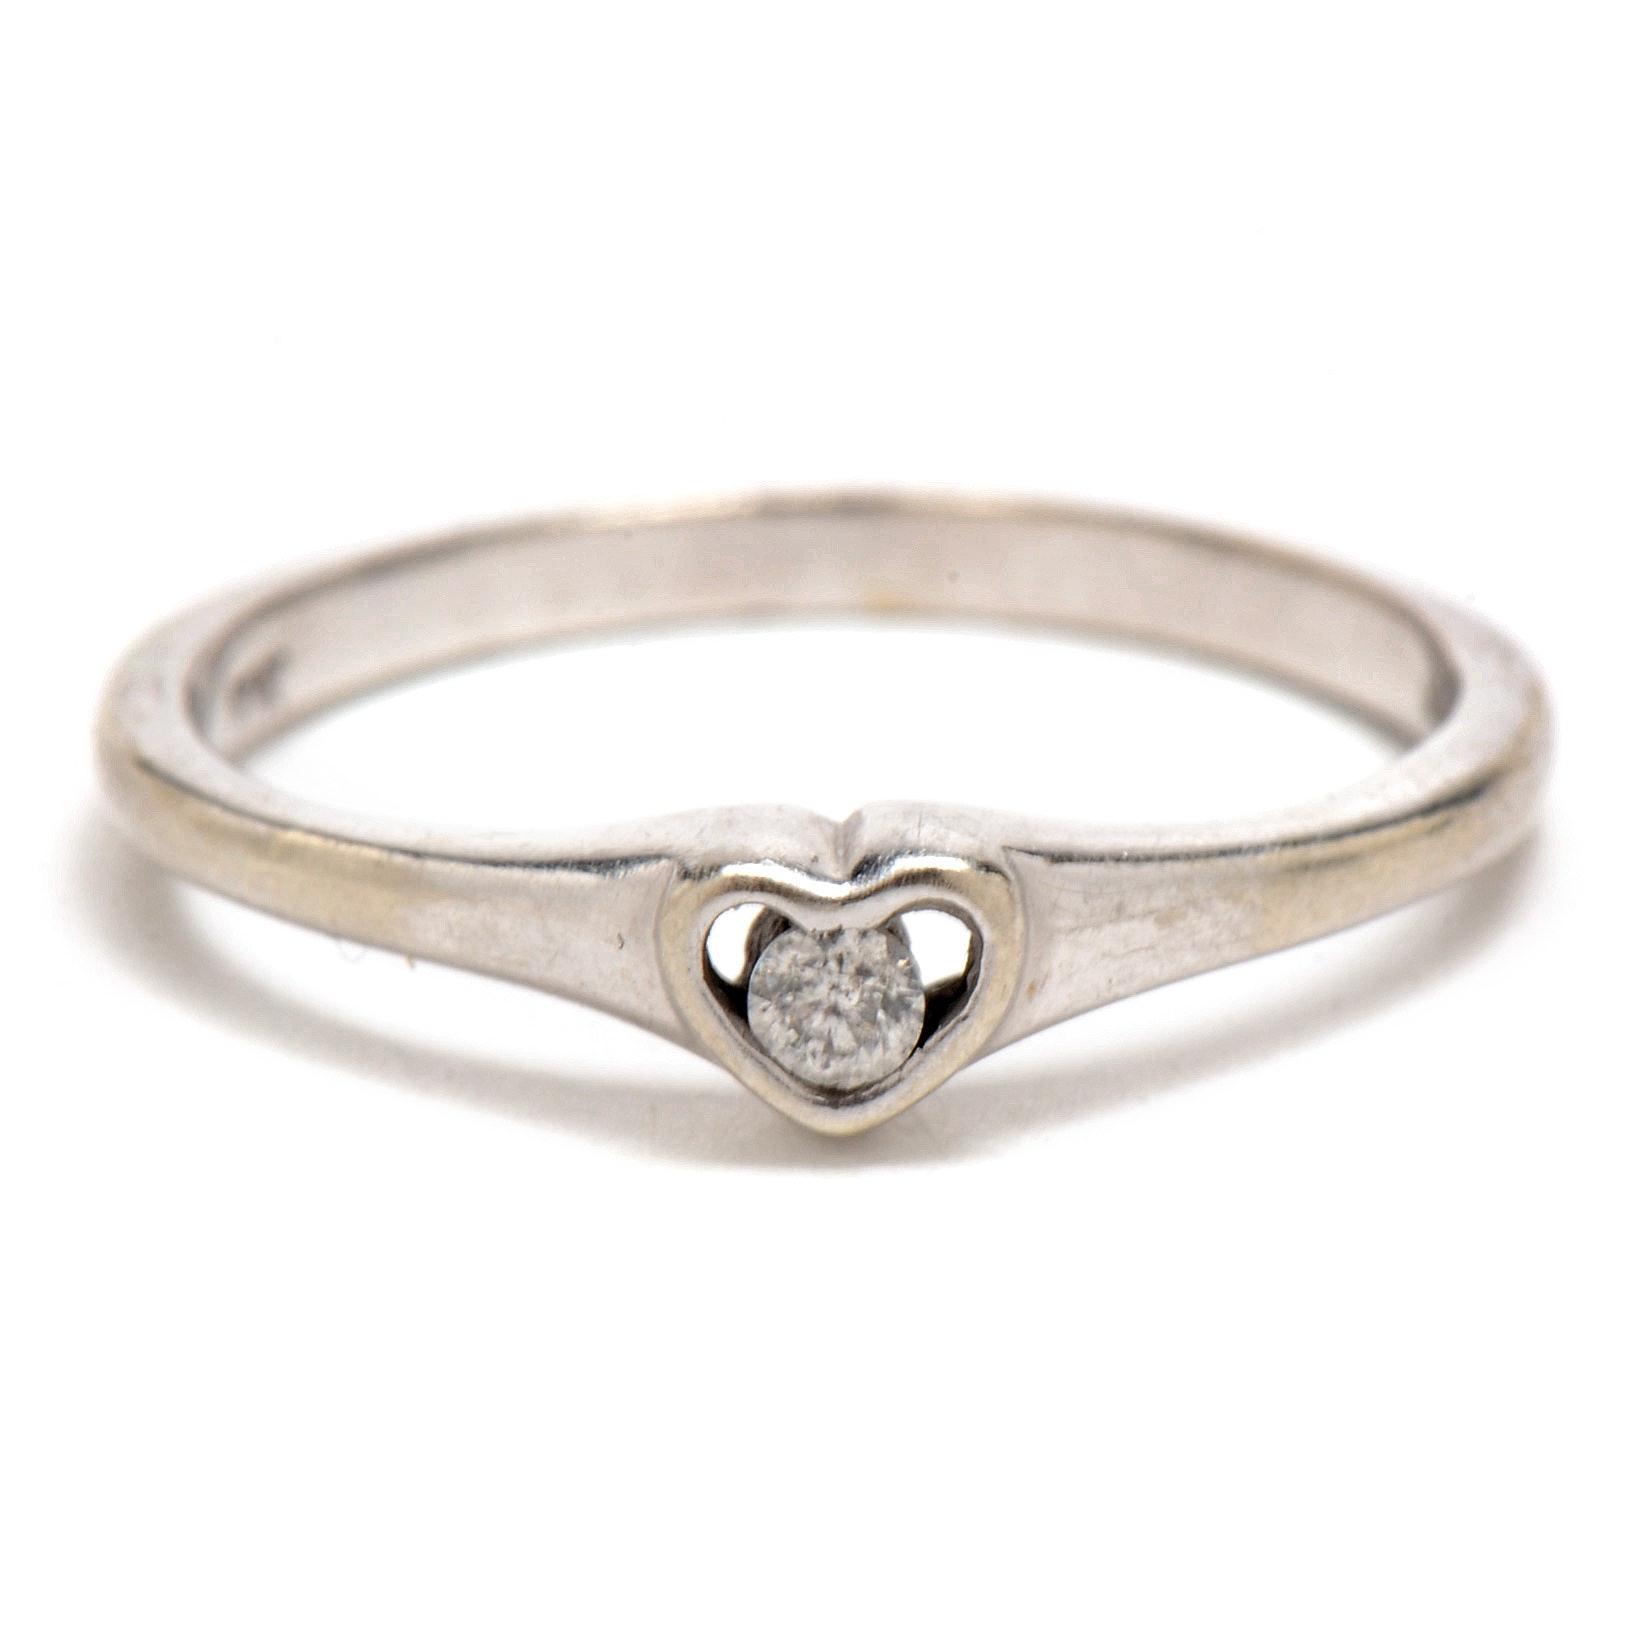 10K White Gold Diamond Solitaire Heart Ring